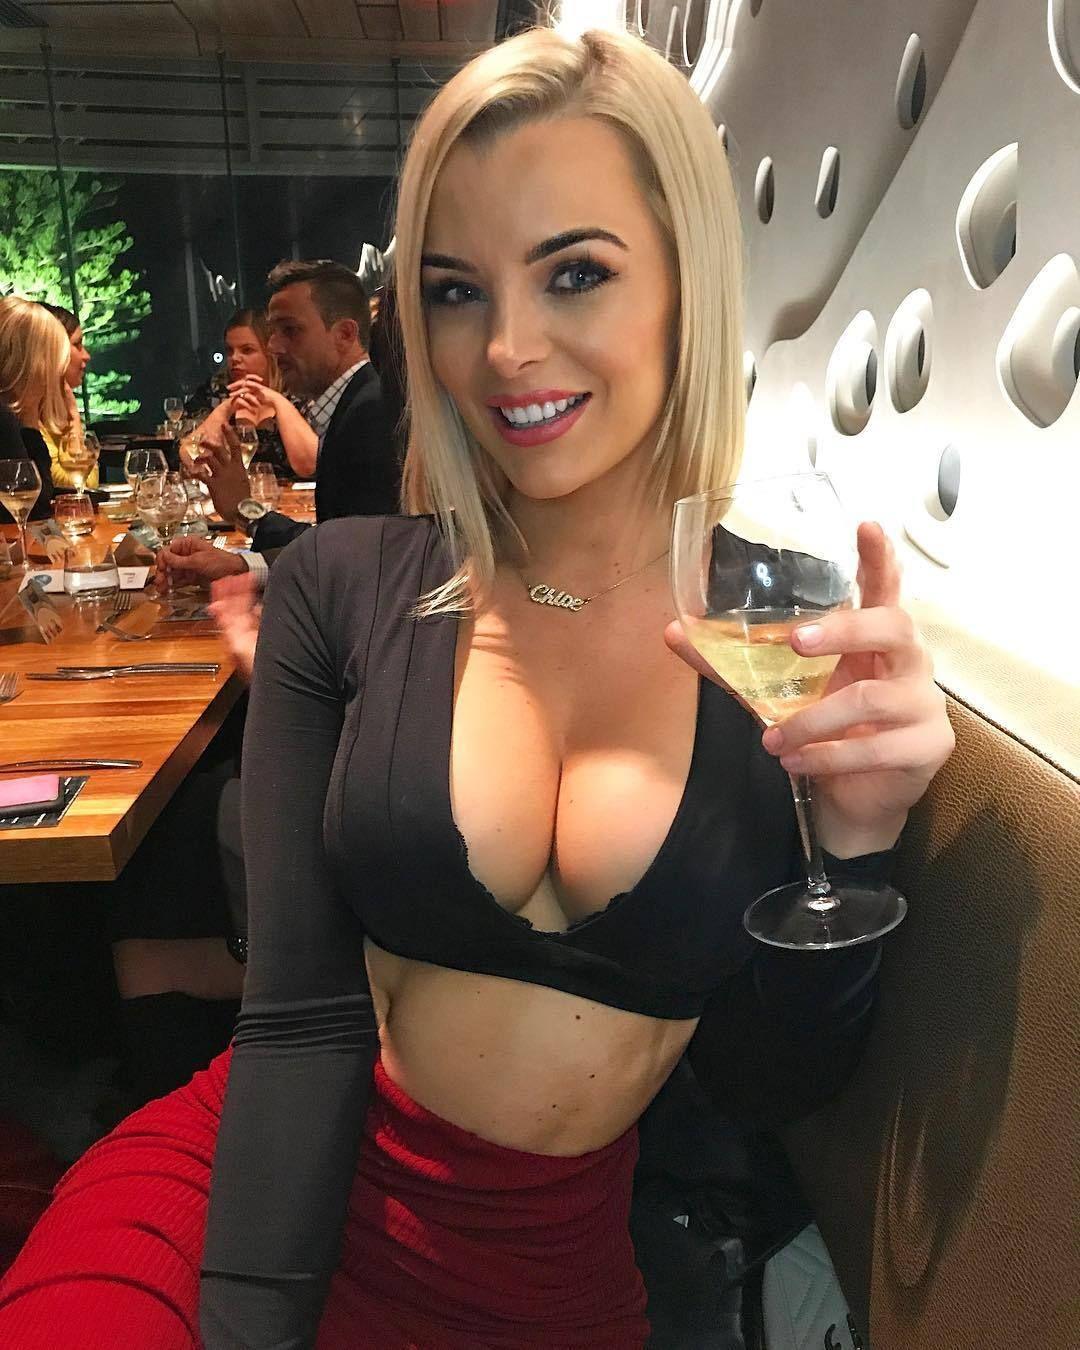 Sexy girdle pics